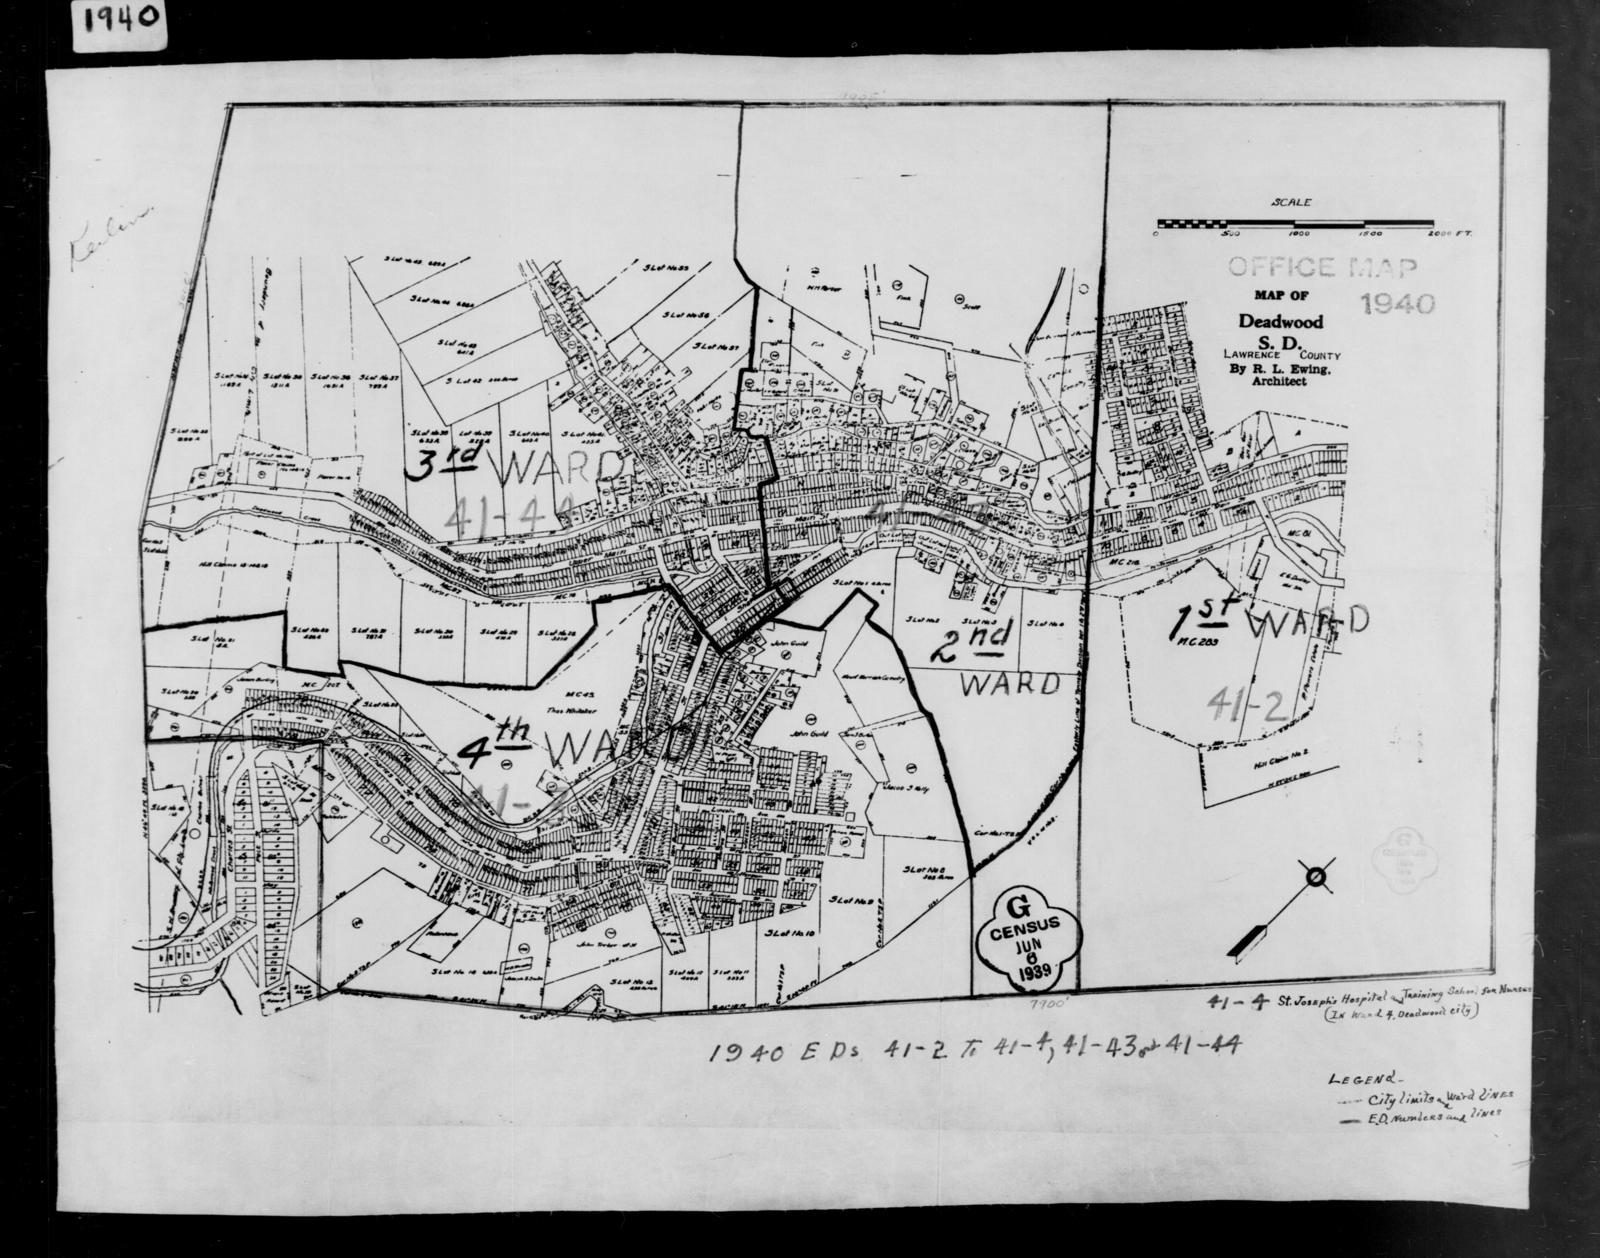 1940 Census Enumeration District Maps - South Dakota ... on deadwood lake idaho map, western idaho road map, kooskia id map,